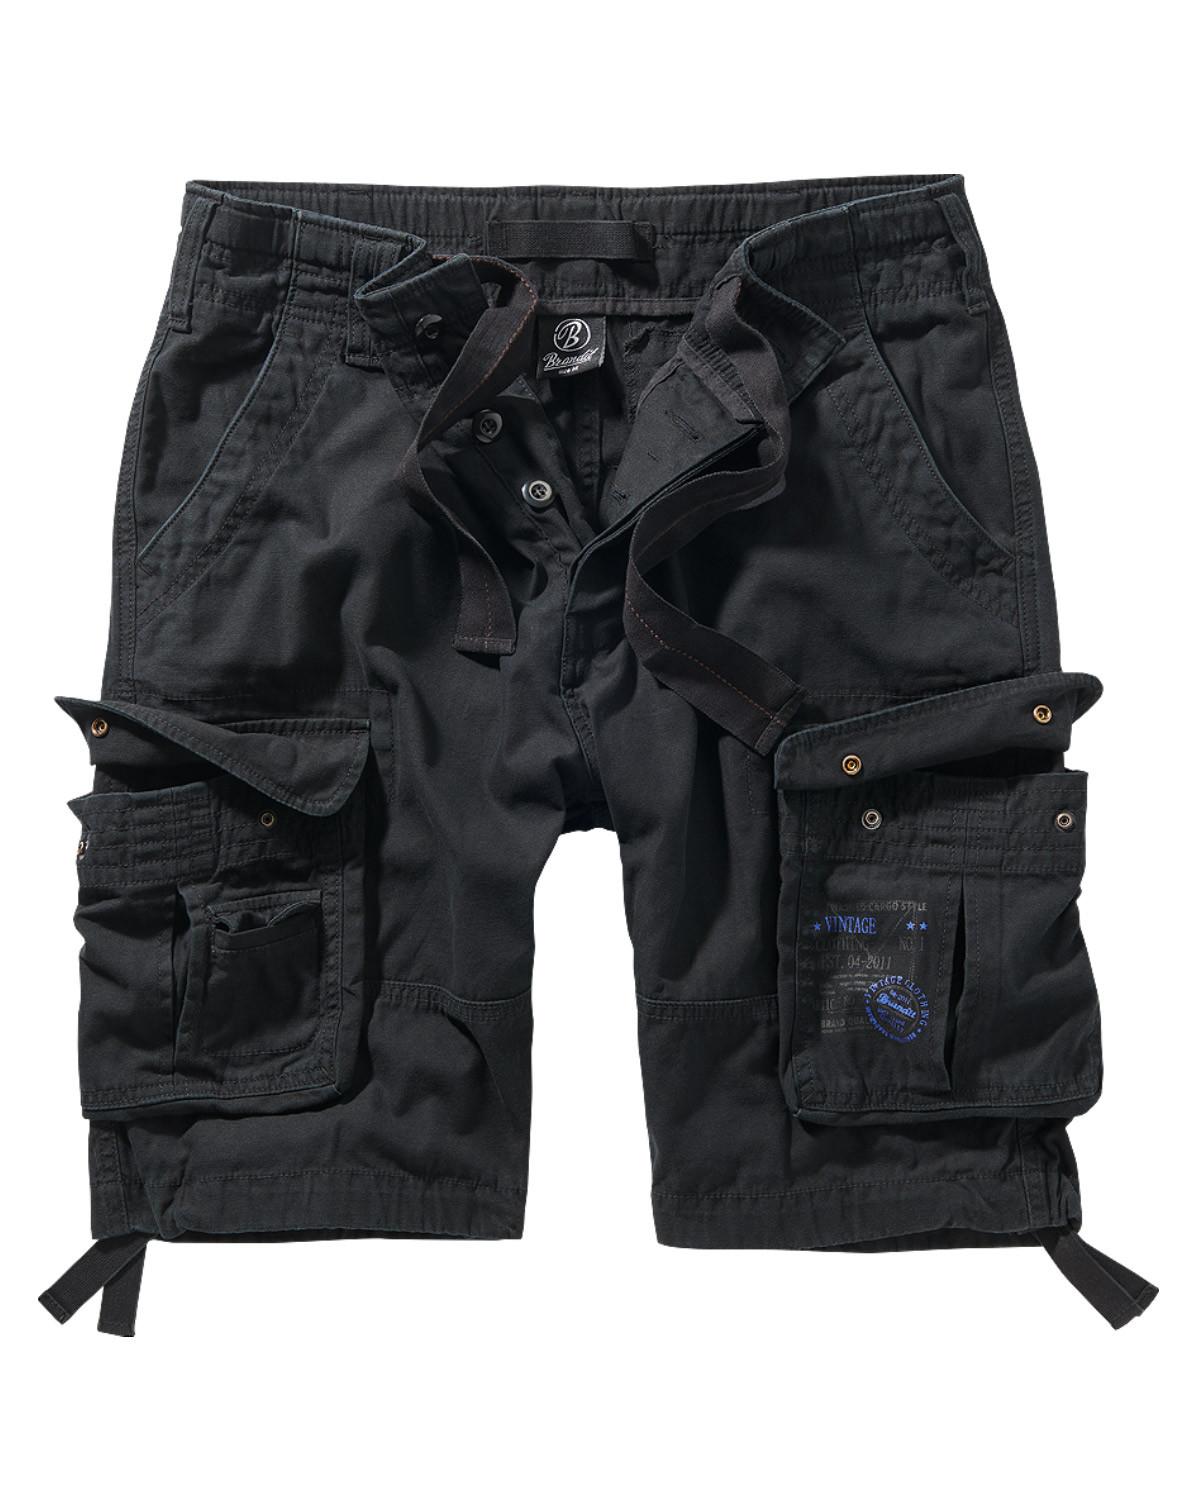 Image of   Brandit Pure Vintage Shorts (Sort, 2XL)